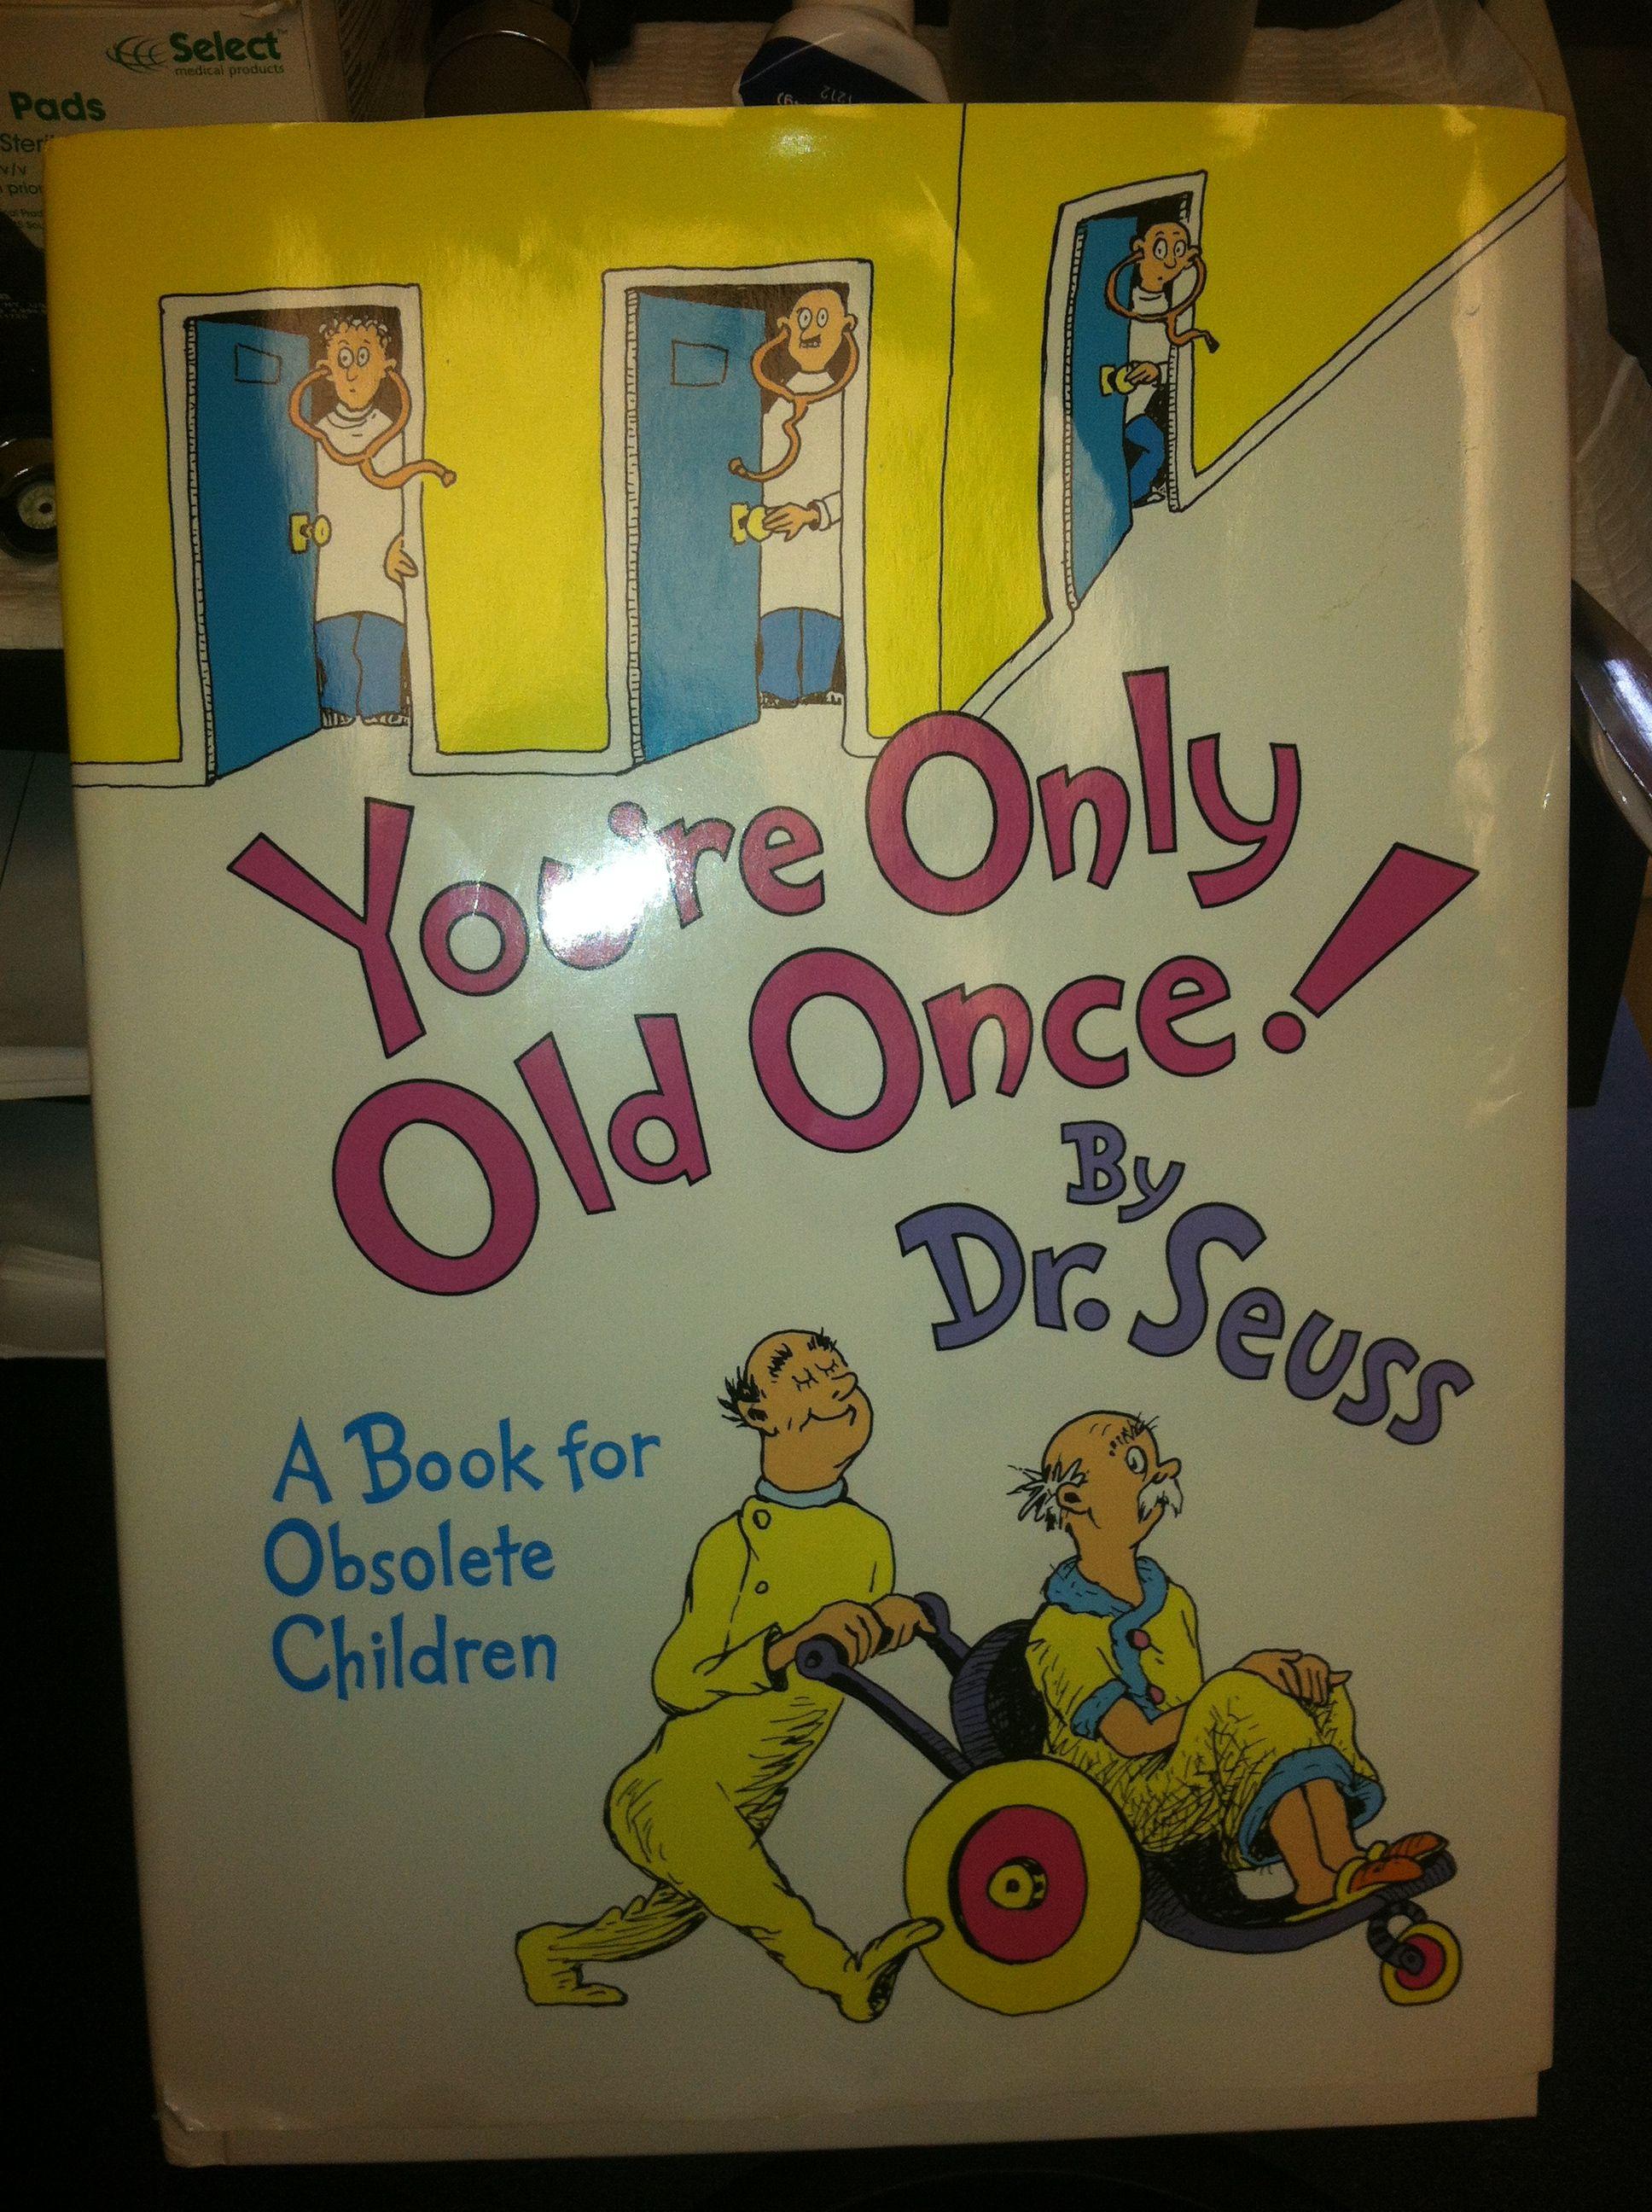 Dr seuss book on aging classic seuss novelty sign